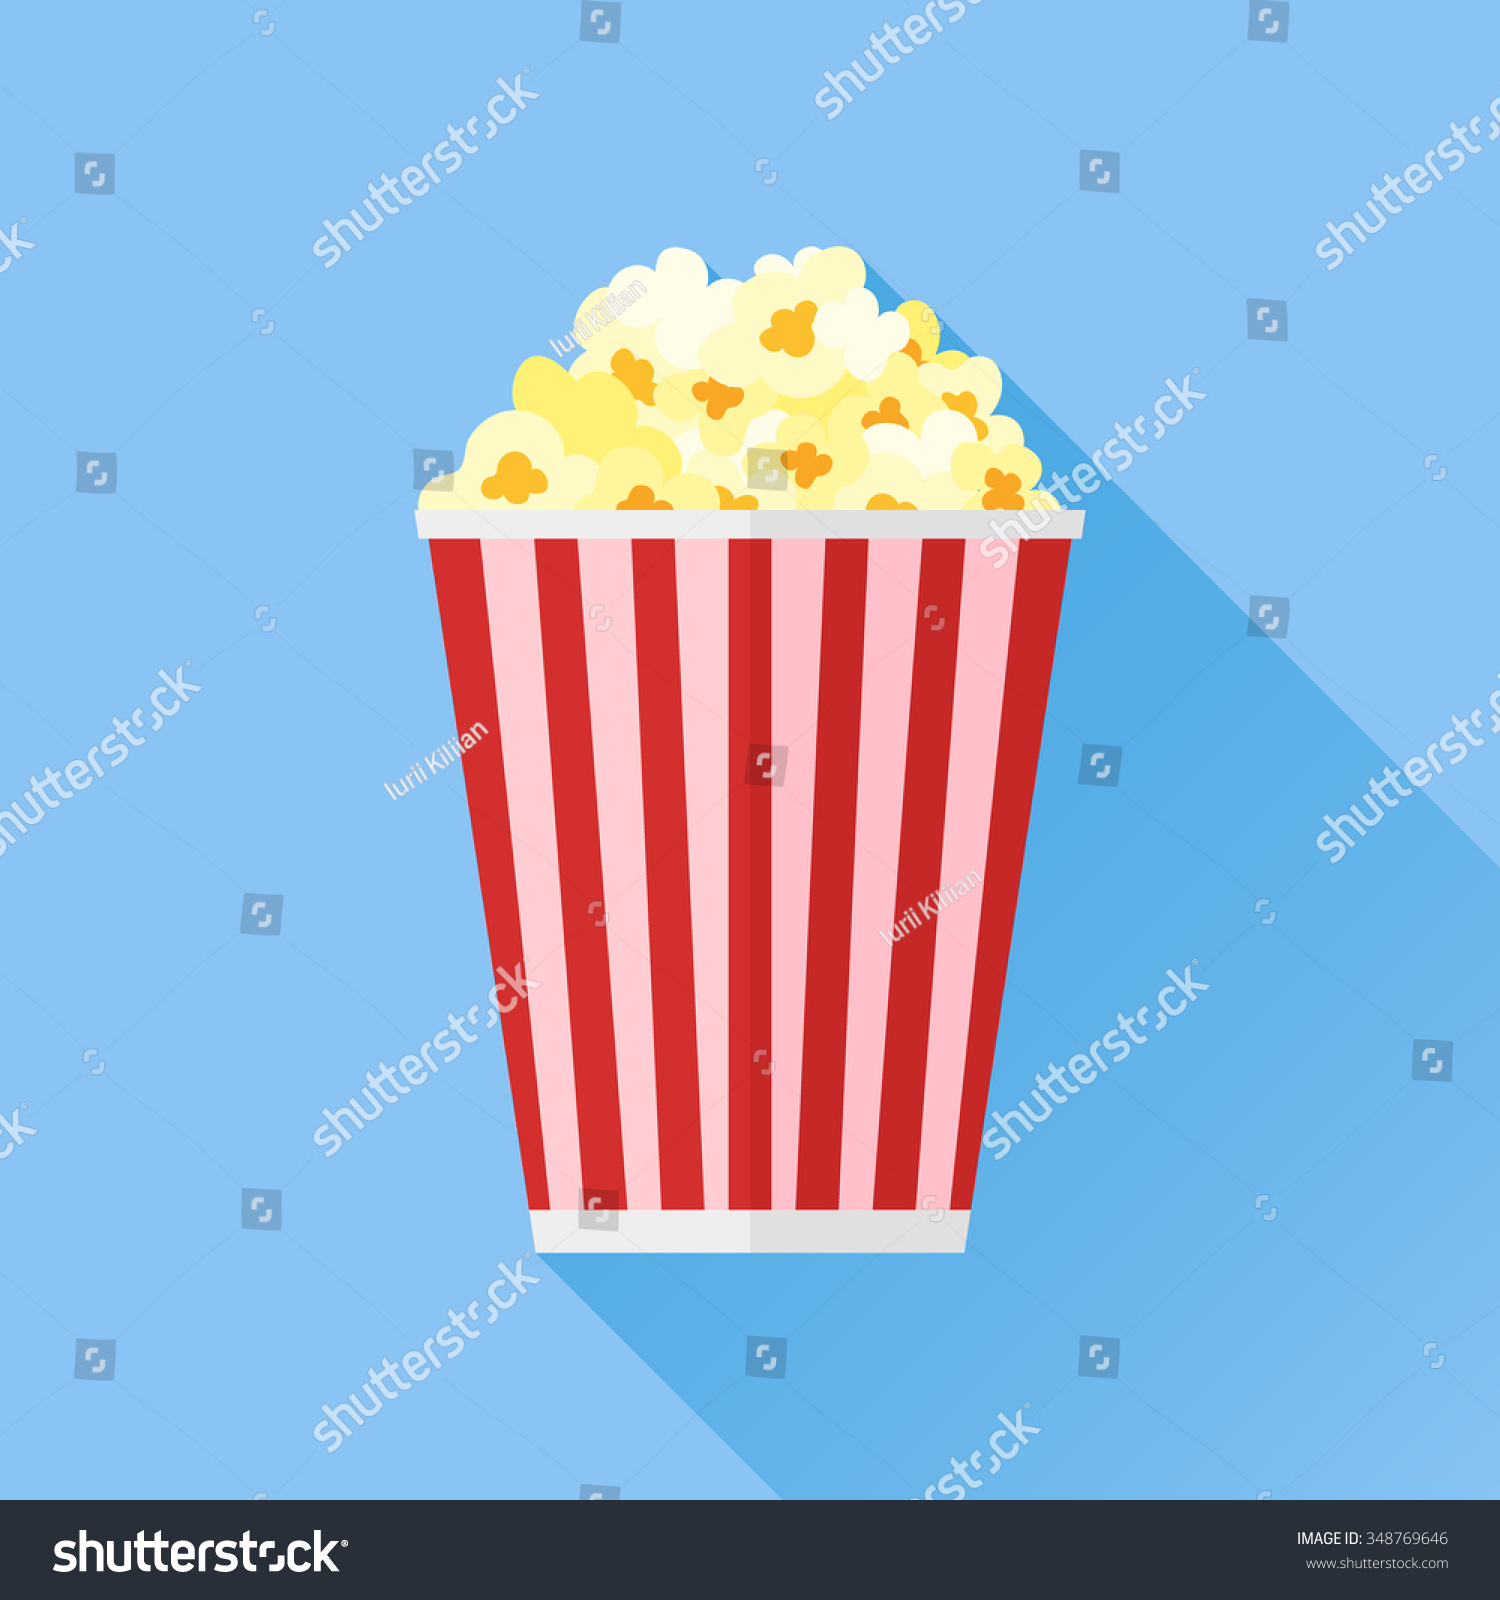 Popcorn Flat Icon Stock Vector 348769646 - Shutterstock